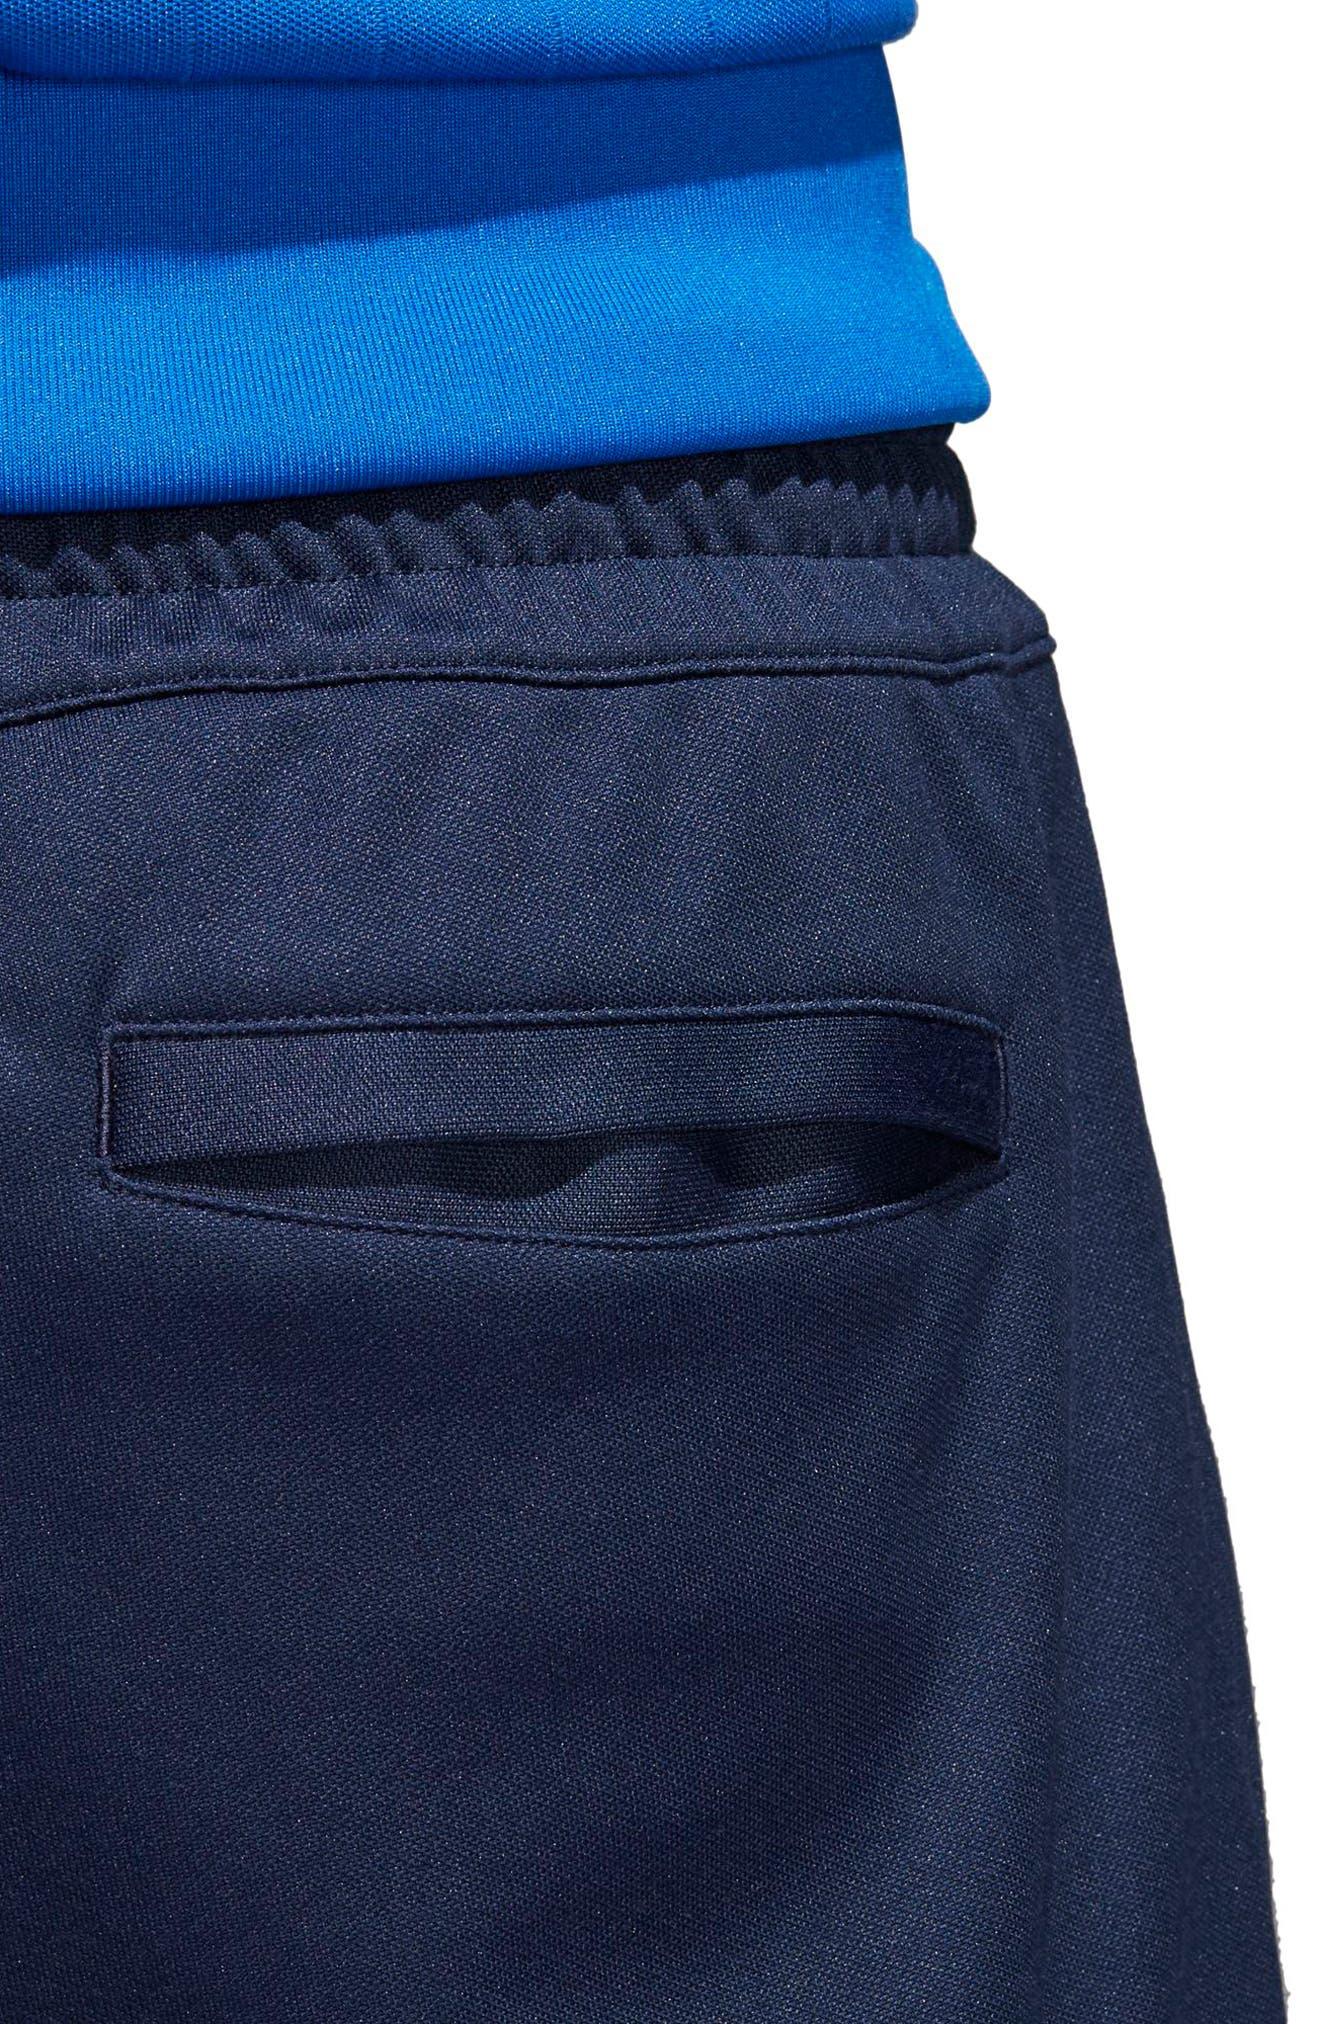 Originals Training Pants,                             Alternate thumbnail 4, color,                             415